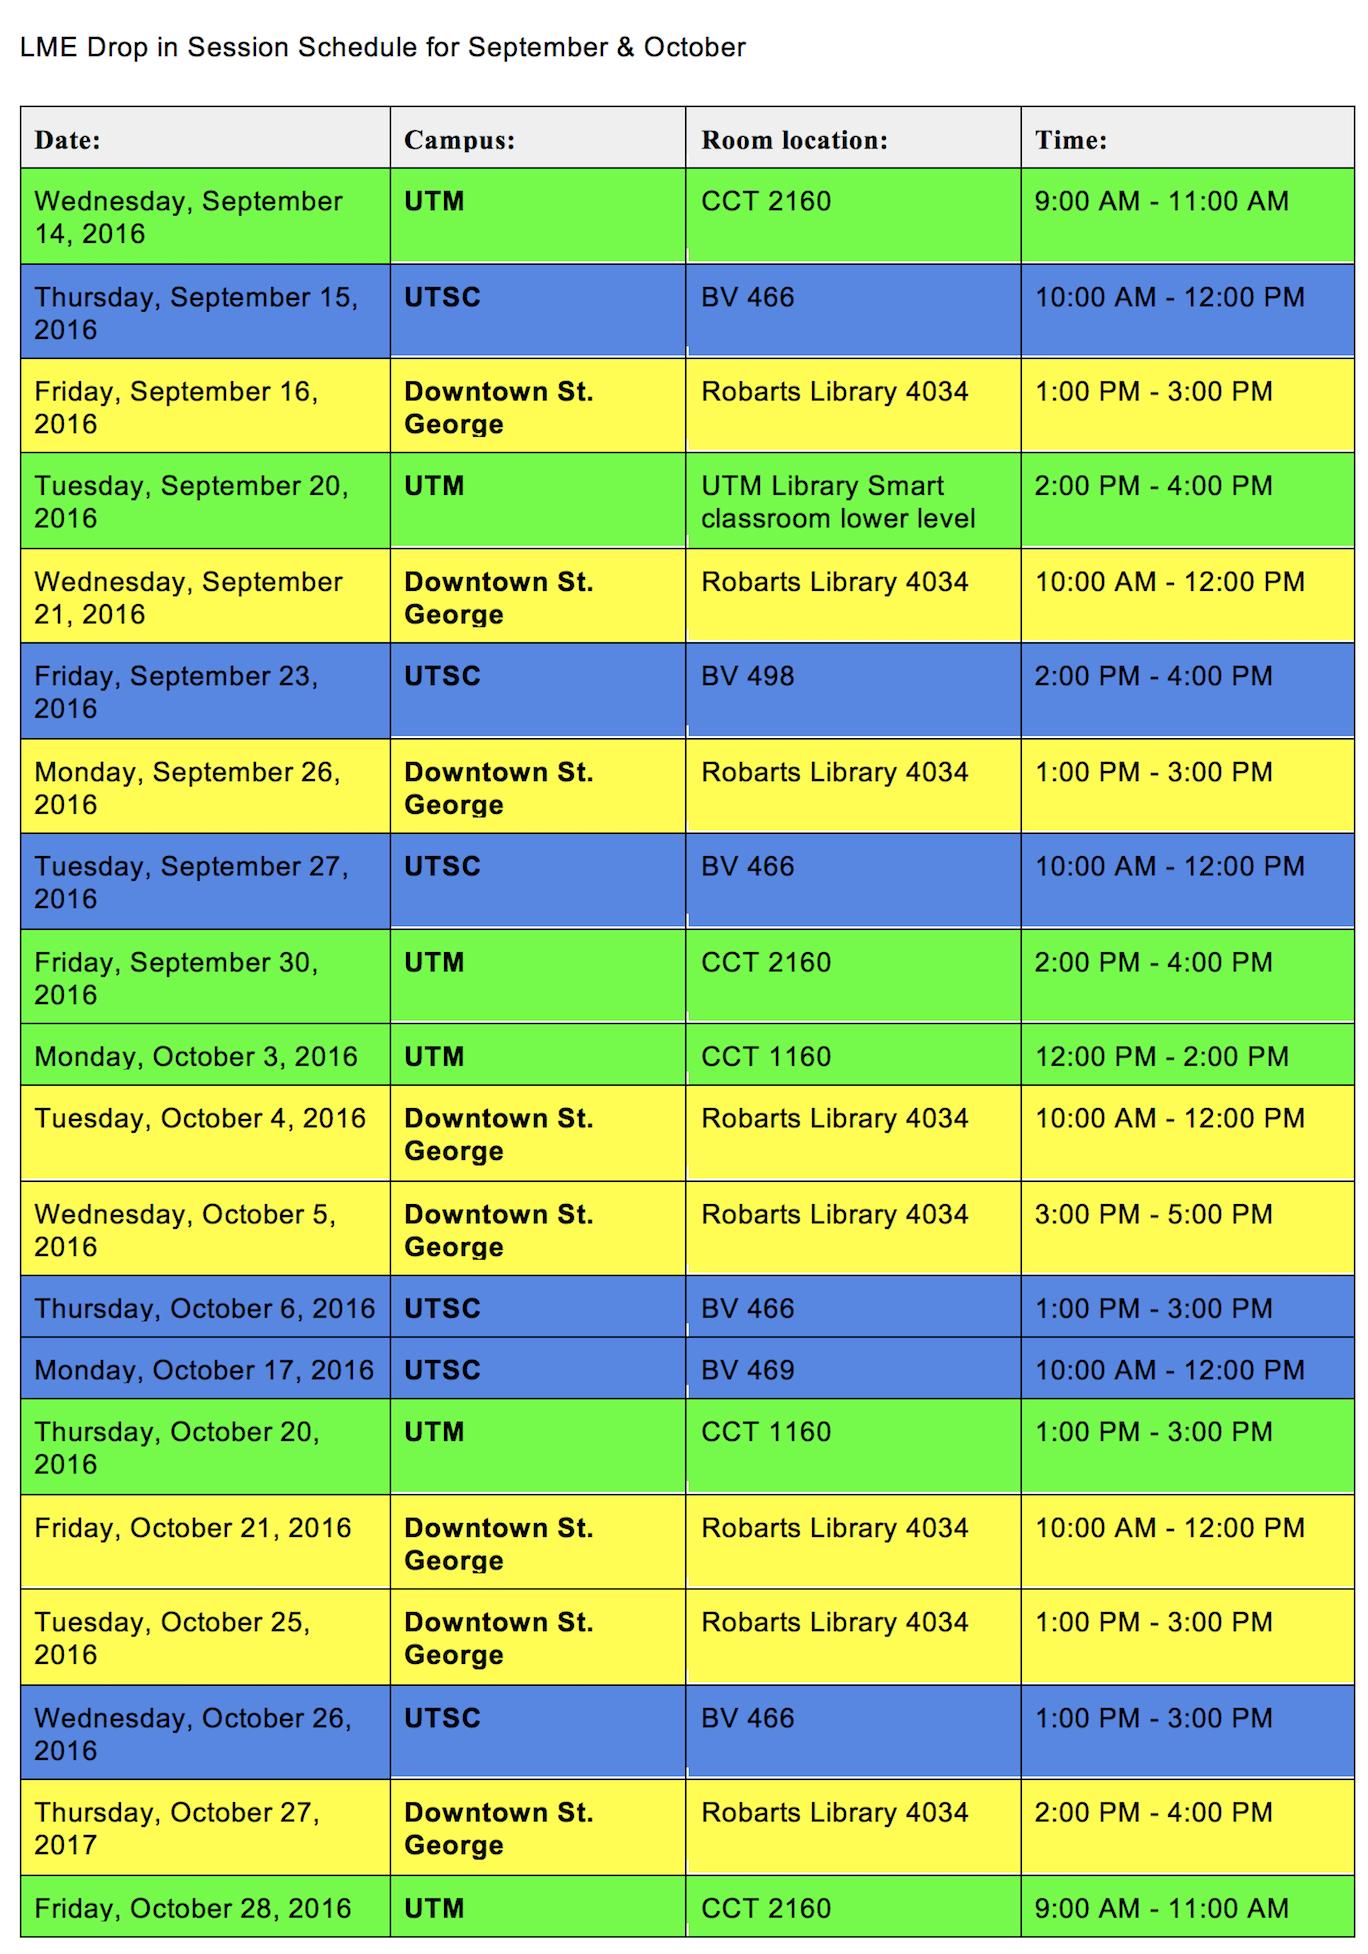 LME Schedule